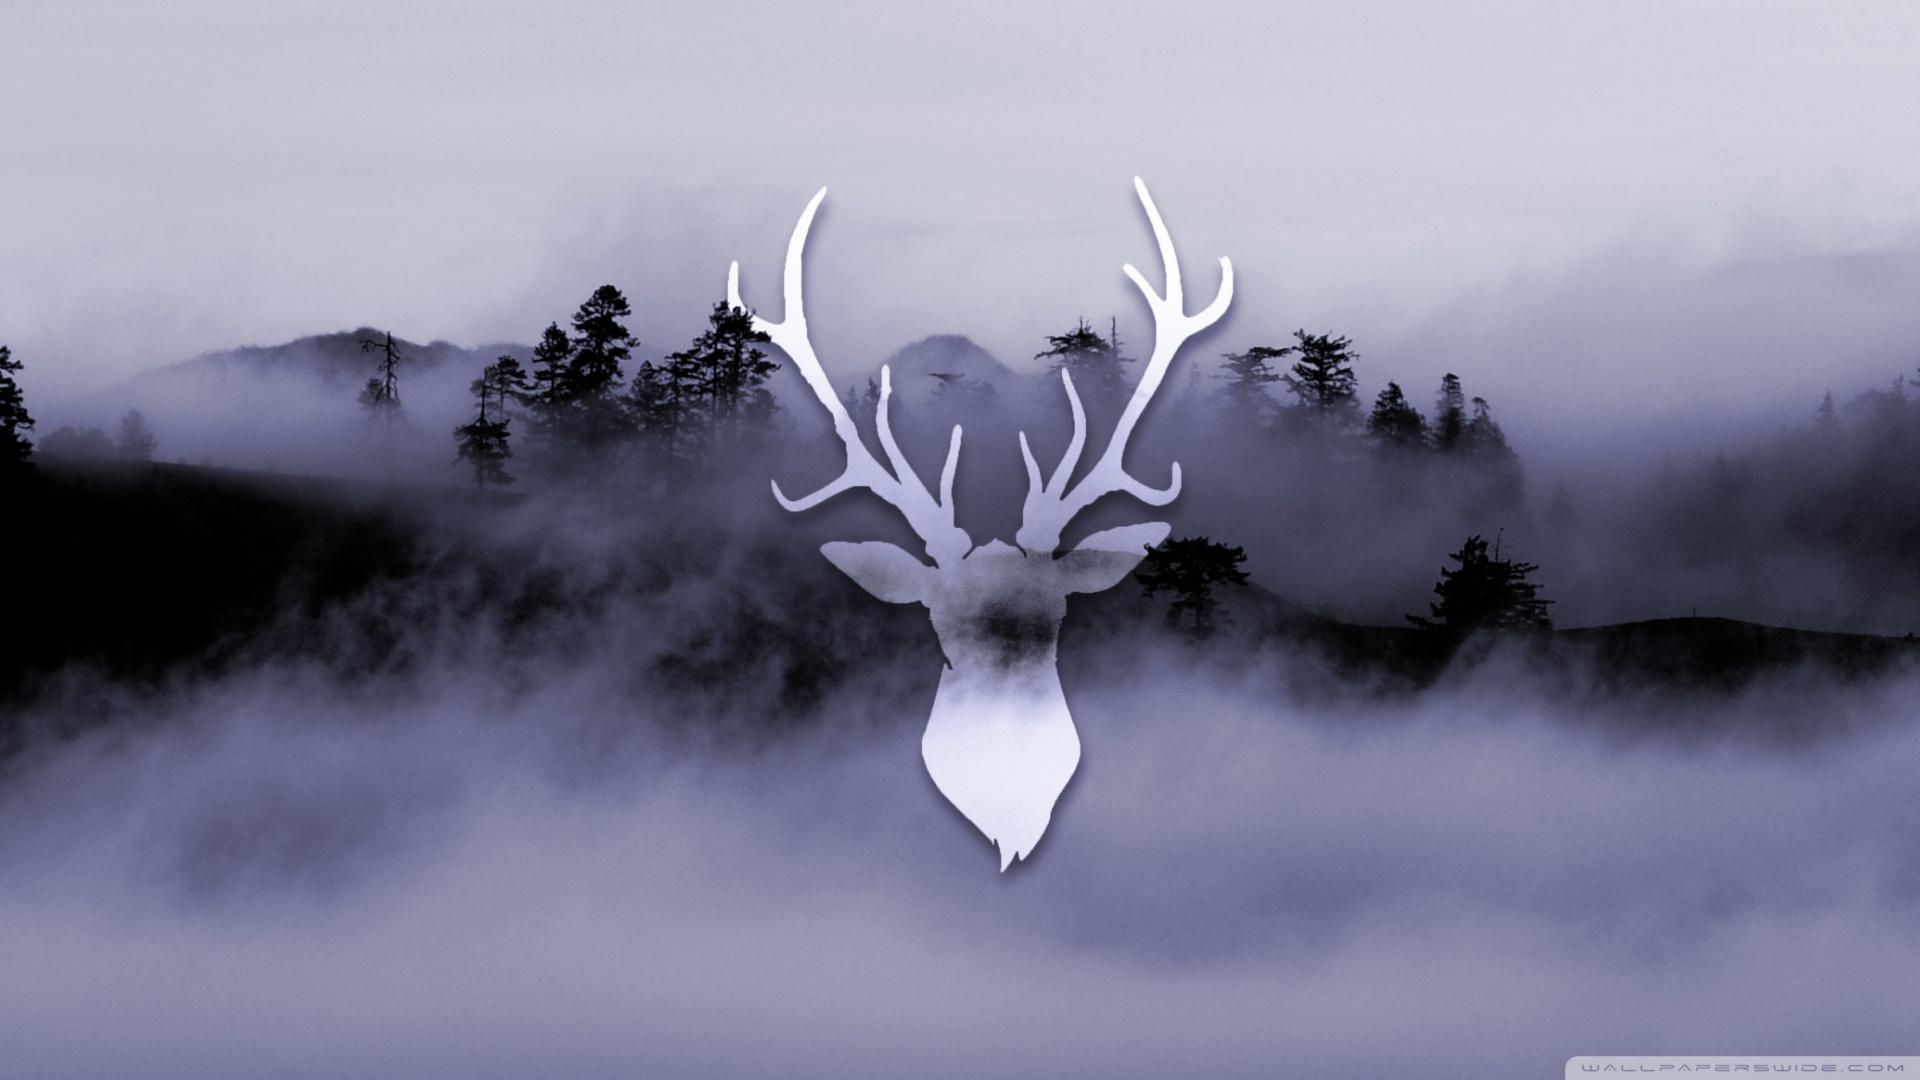 Fall Desktop Wallpaper Widescreen Misty Deer 4k Hd Desktop Wallpaper For 4k Ultra Hd Tv